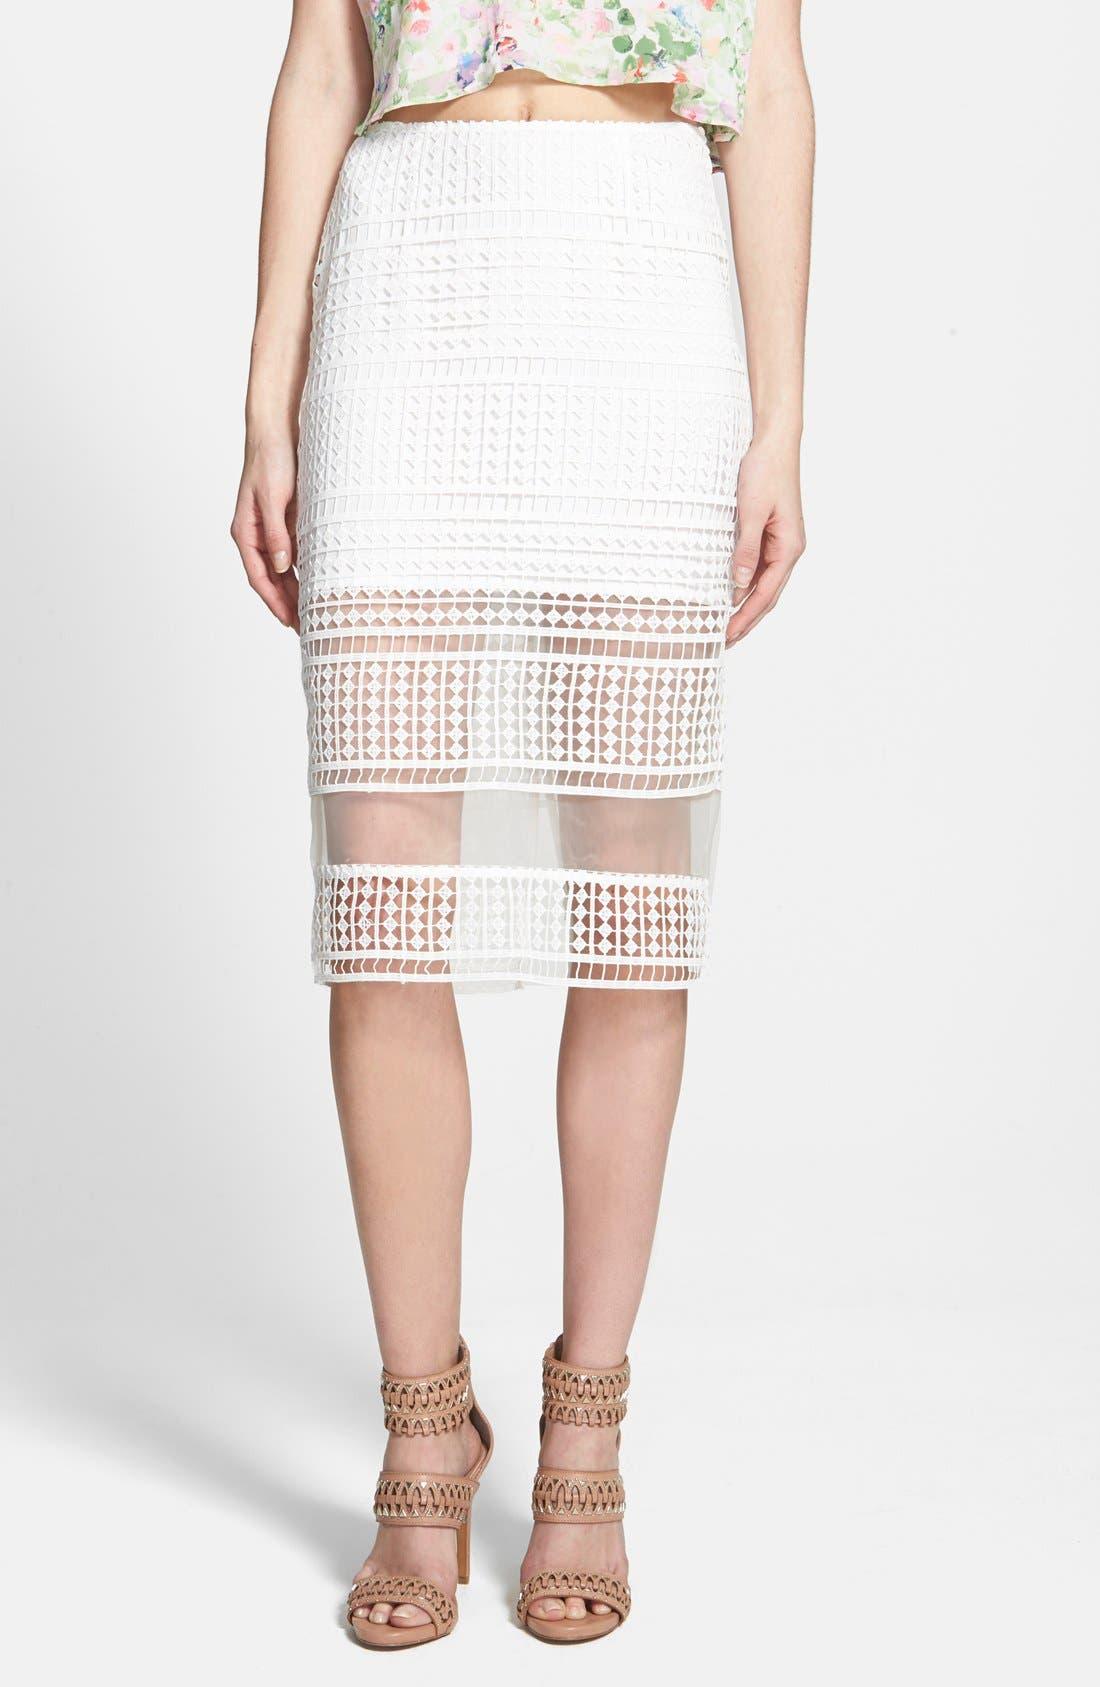 J.O.A. Lace Overlay Pencil Skirt, Main, color, 900